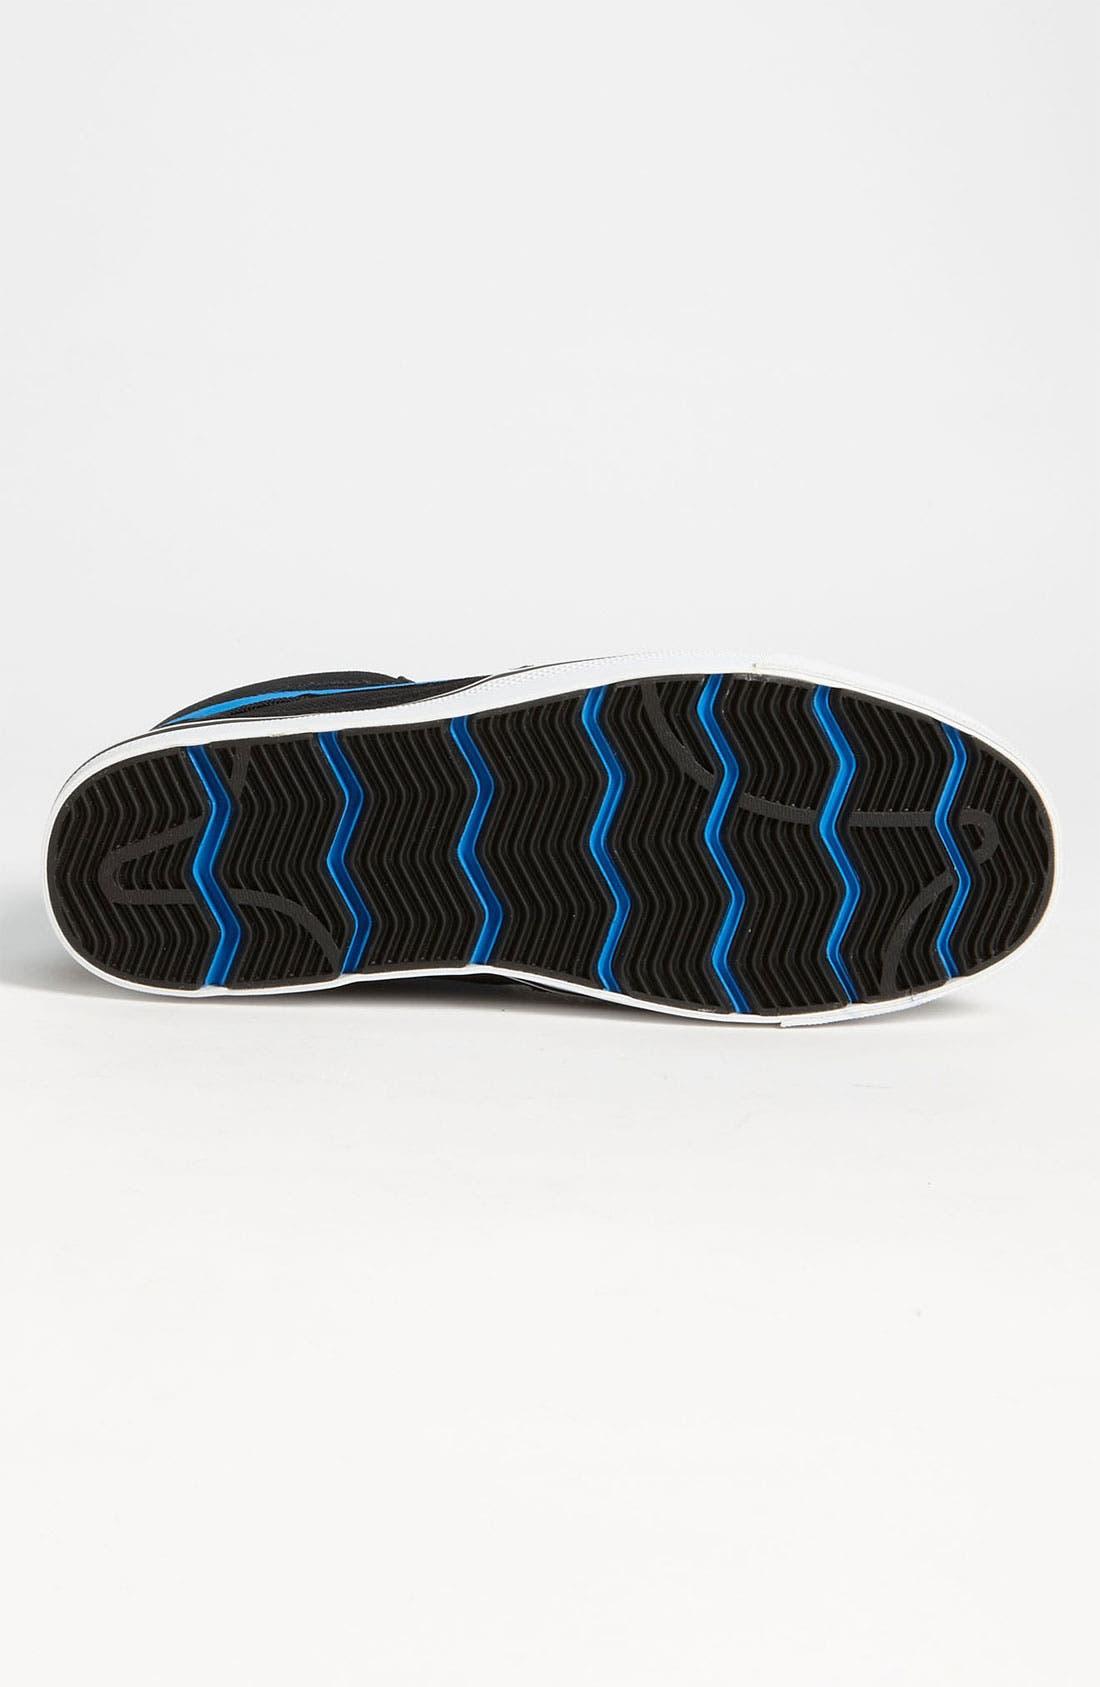 NIKE,                             'Mavrk Mid 2' Sneaker,                             Alternate thumbnail 2, color,                             004